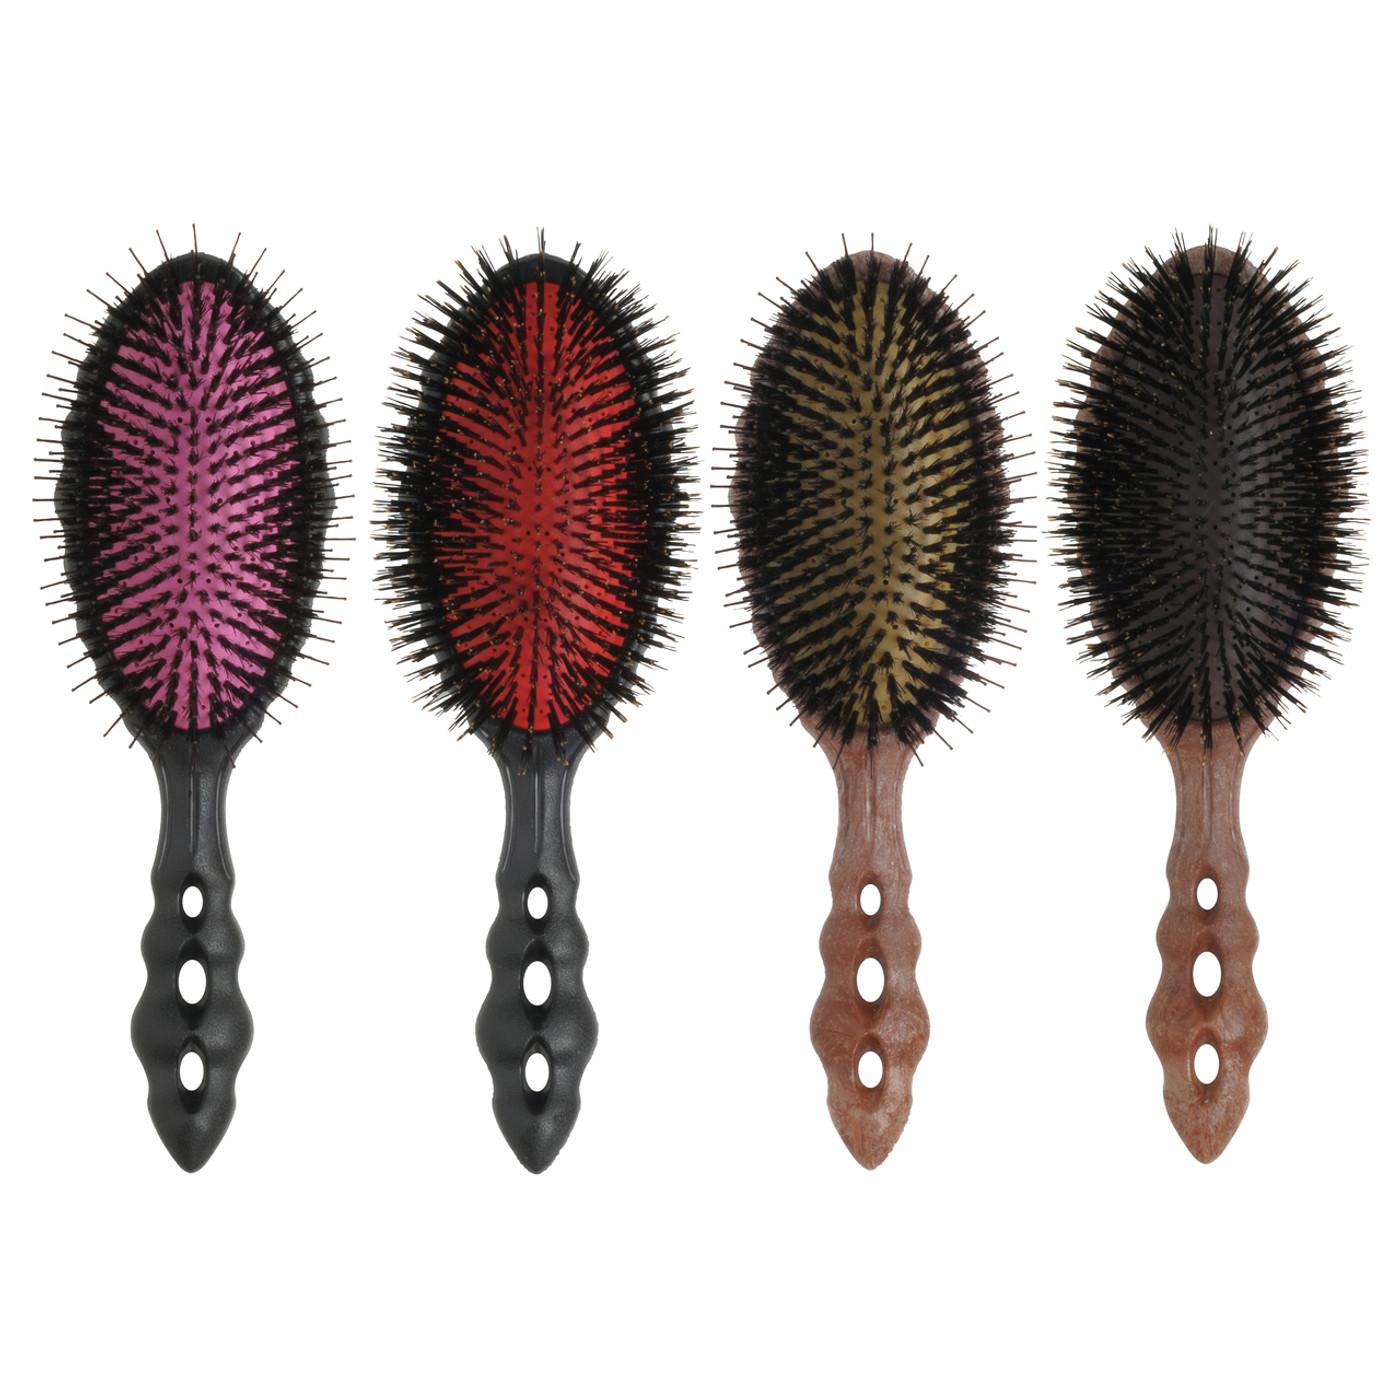 YS Park Beetle Hairbrush Range